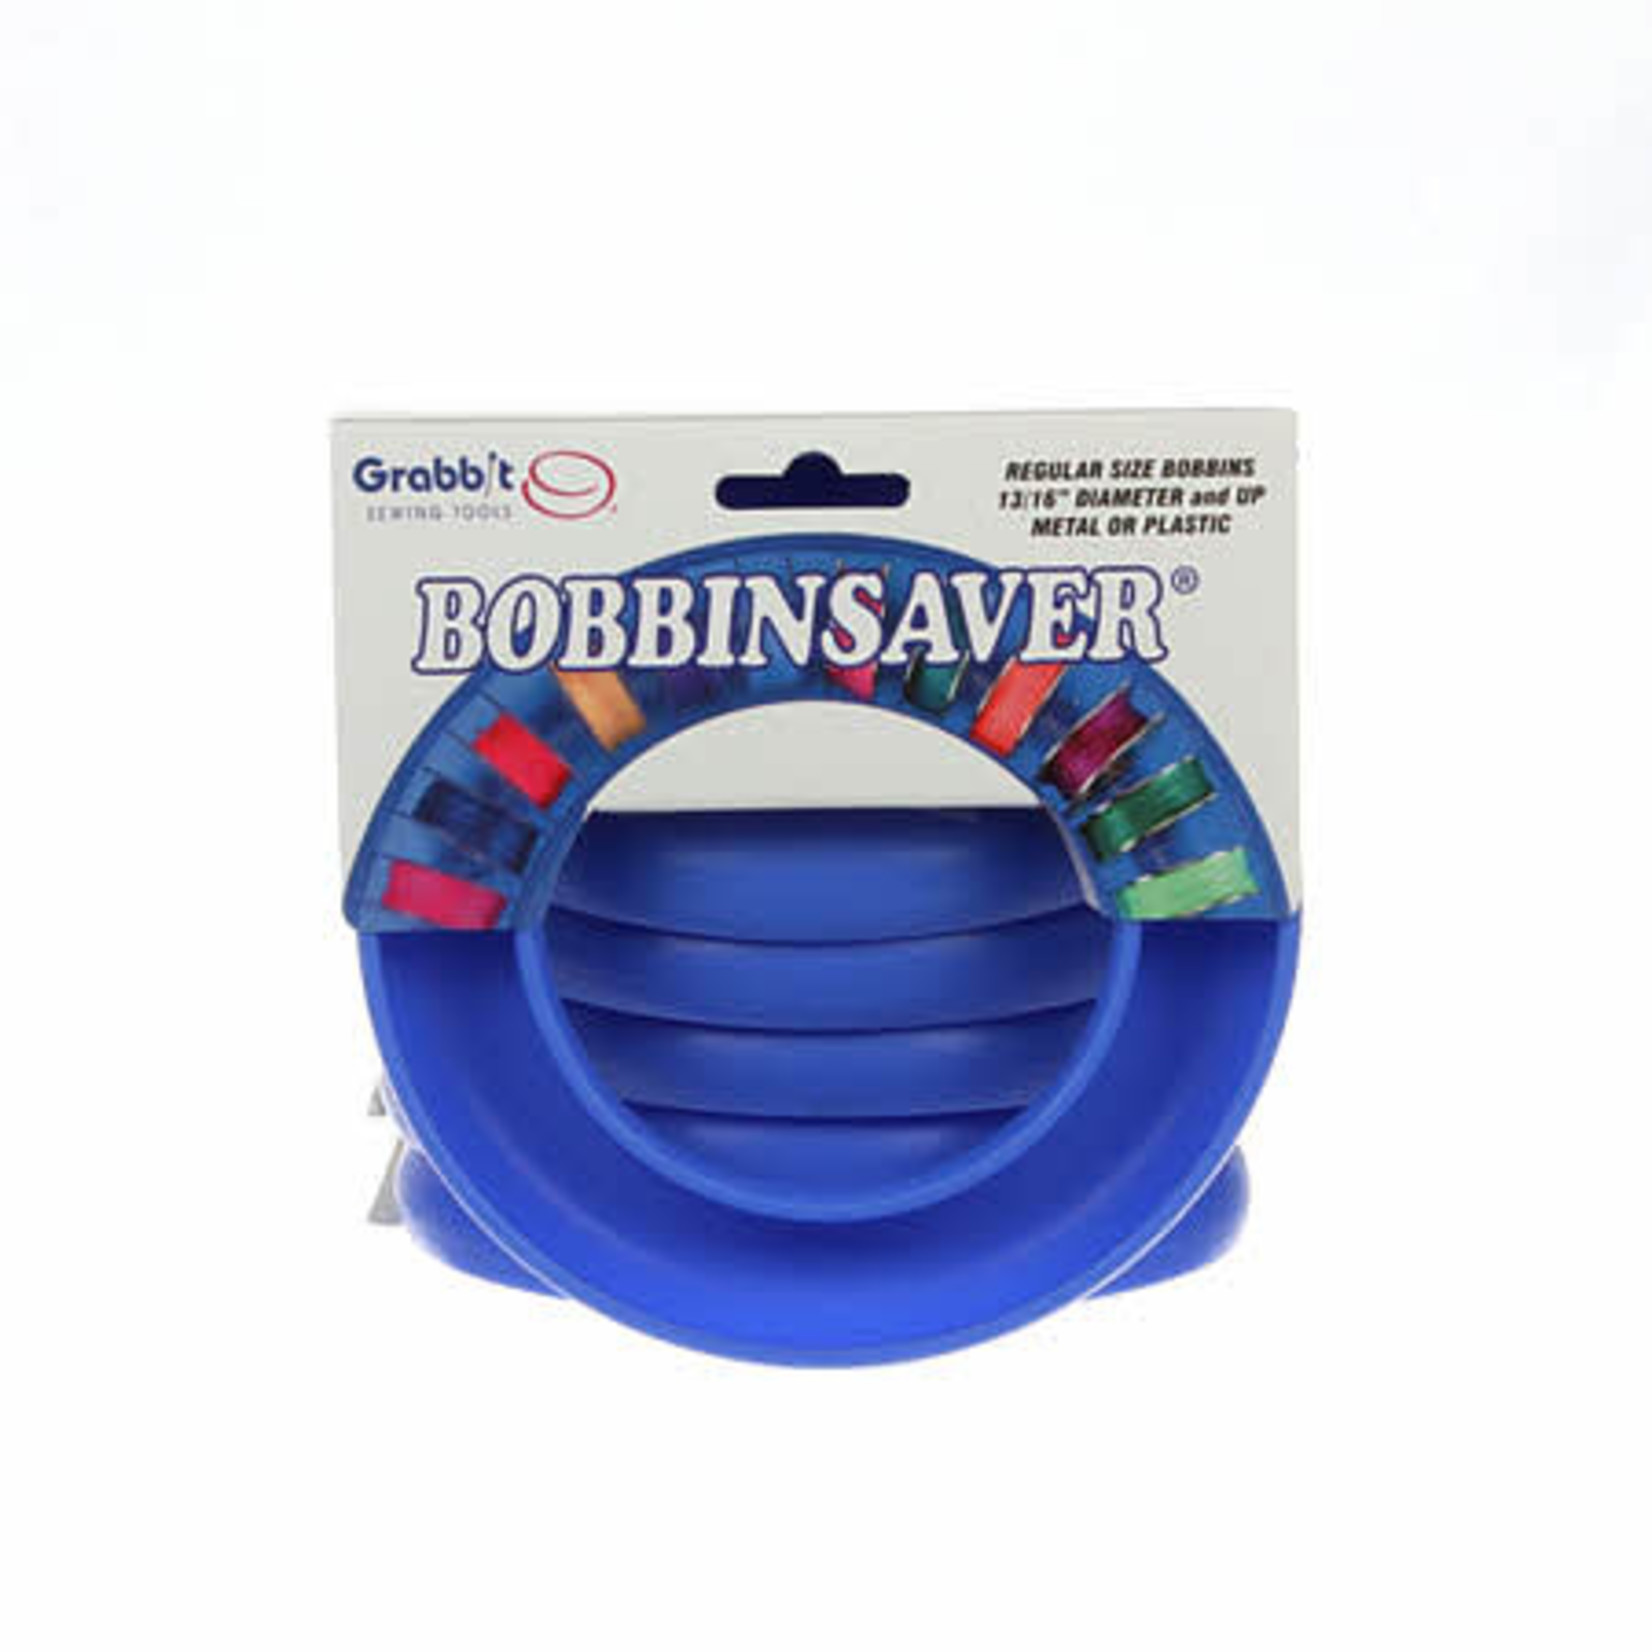 Grabbit Bobbinsaver - Spoelhouder - Blauw